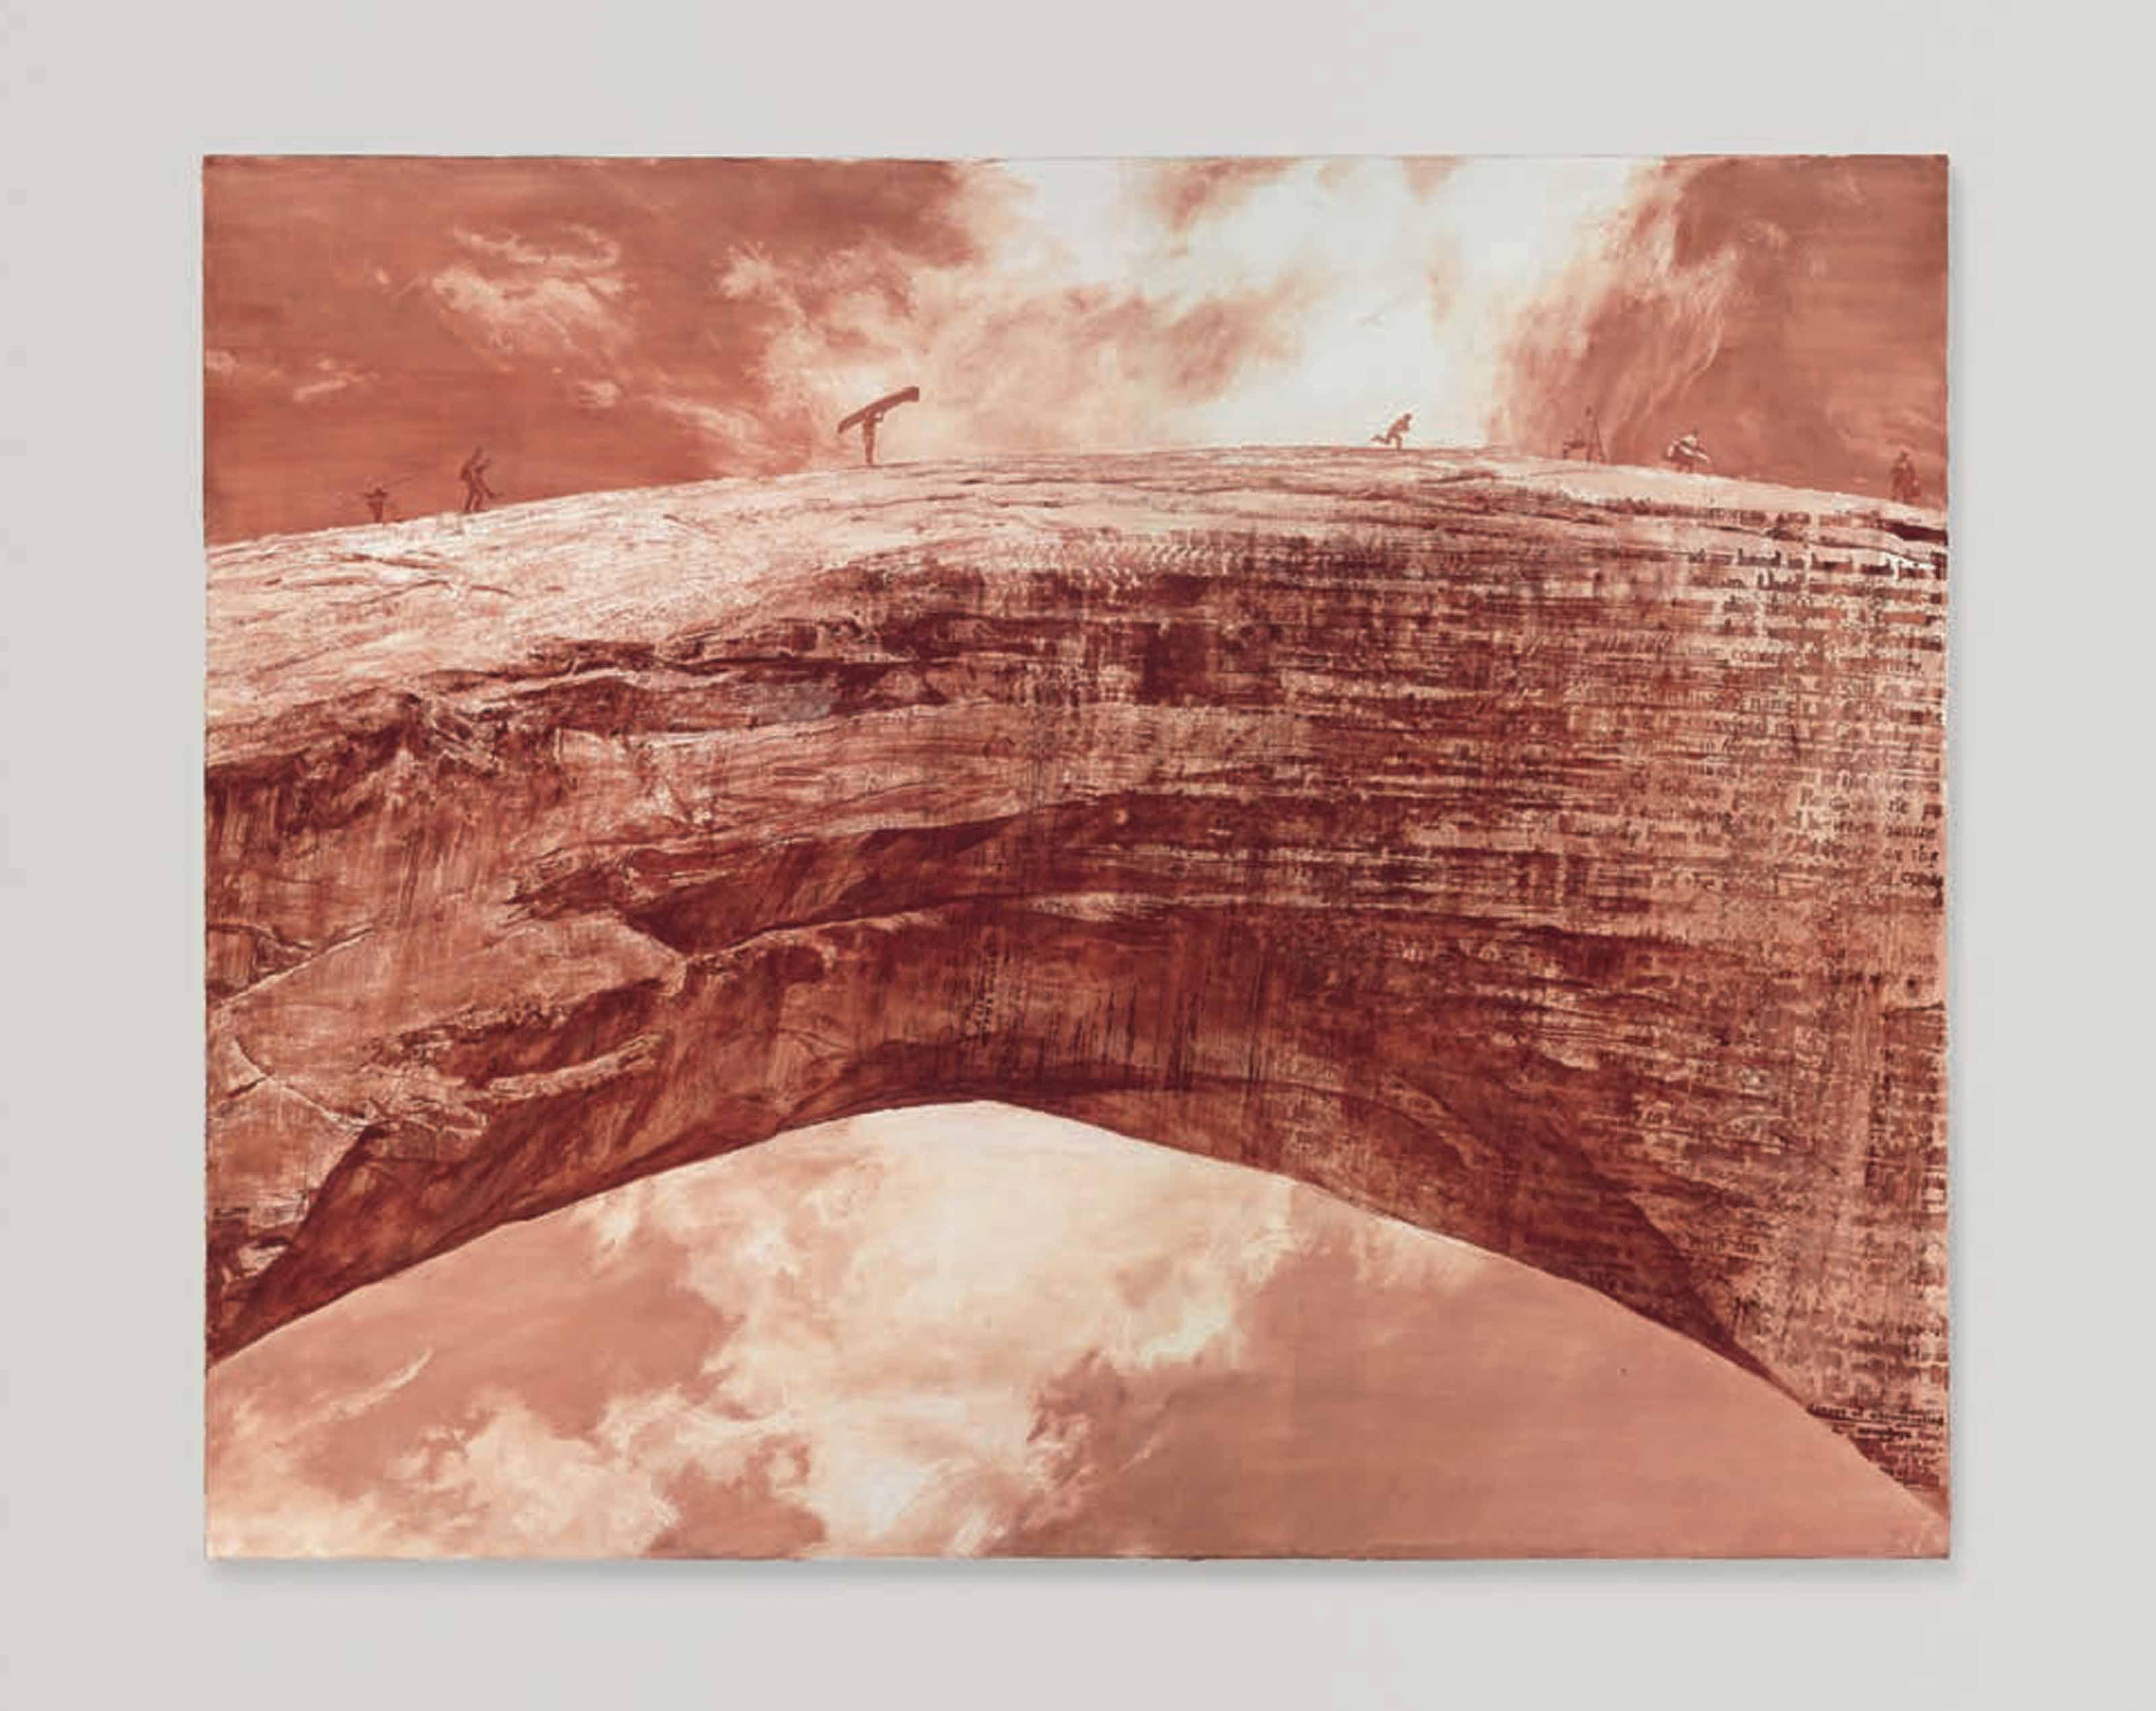 Bridge Over the Cartesian Gap